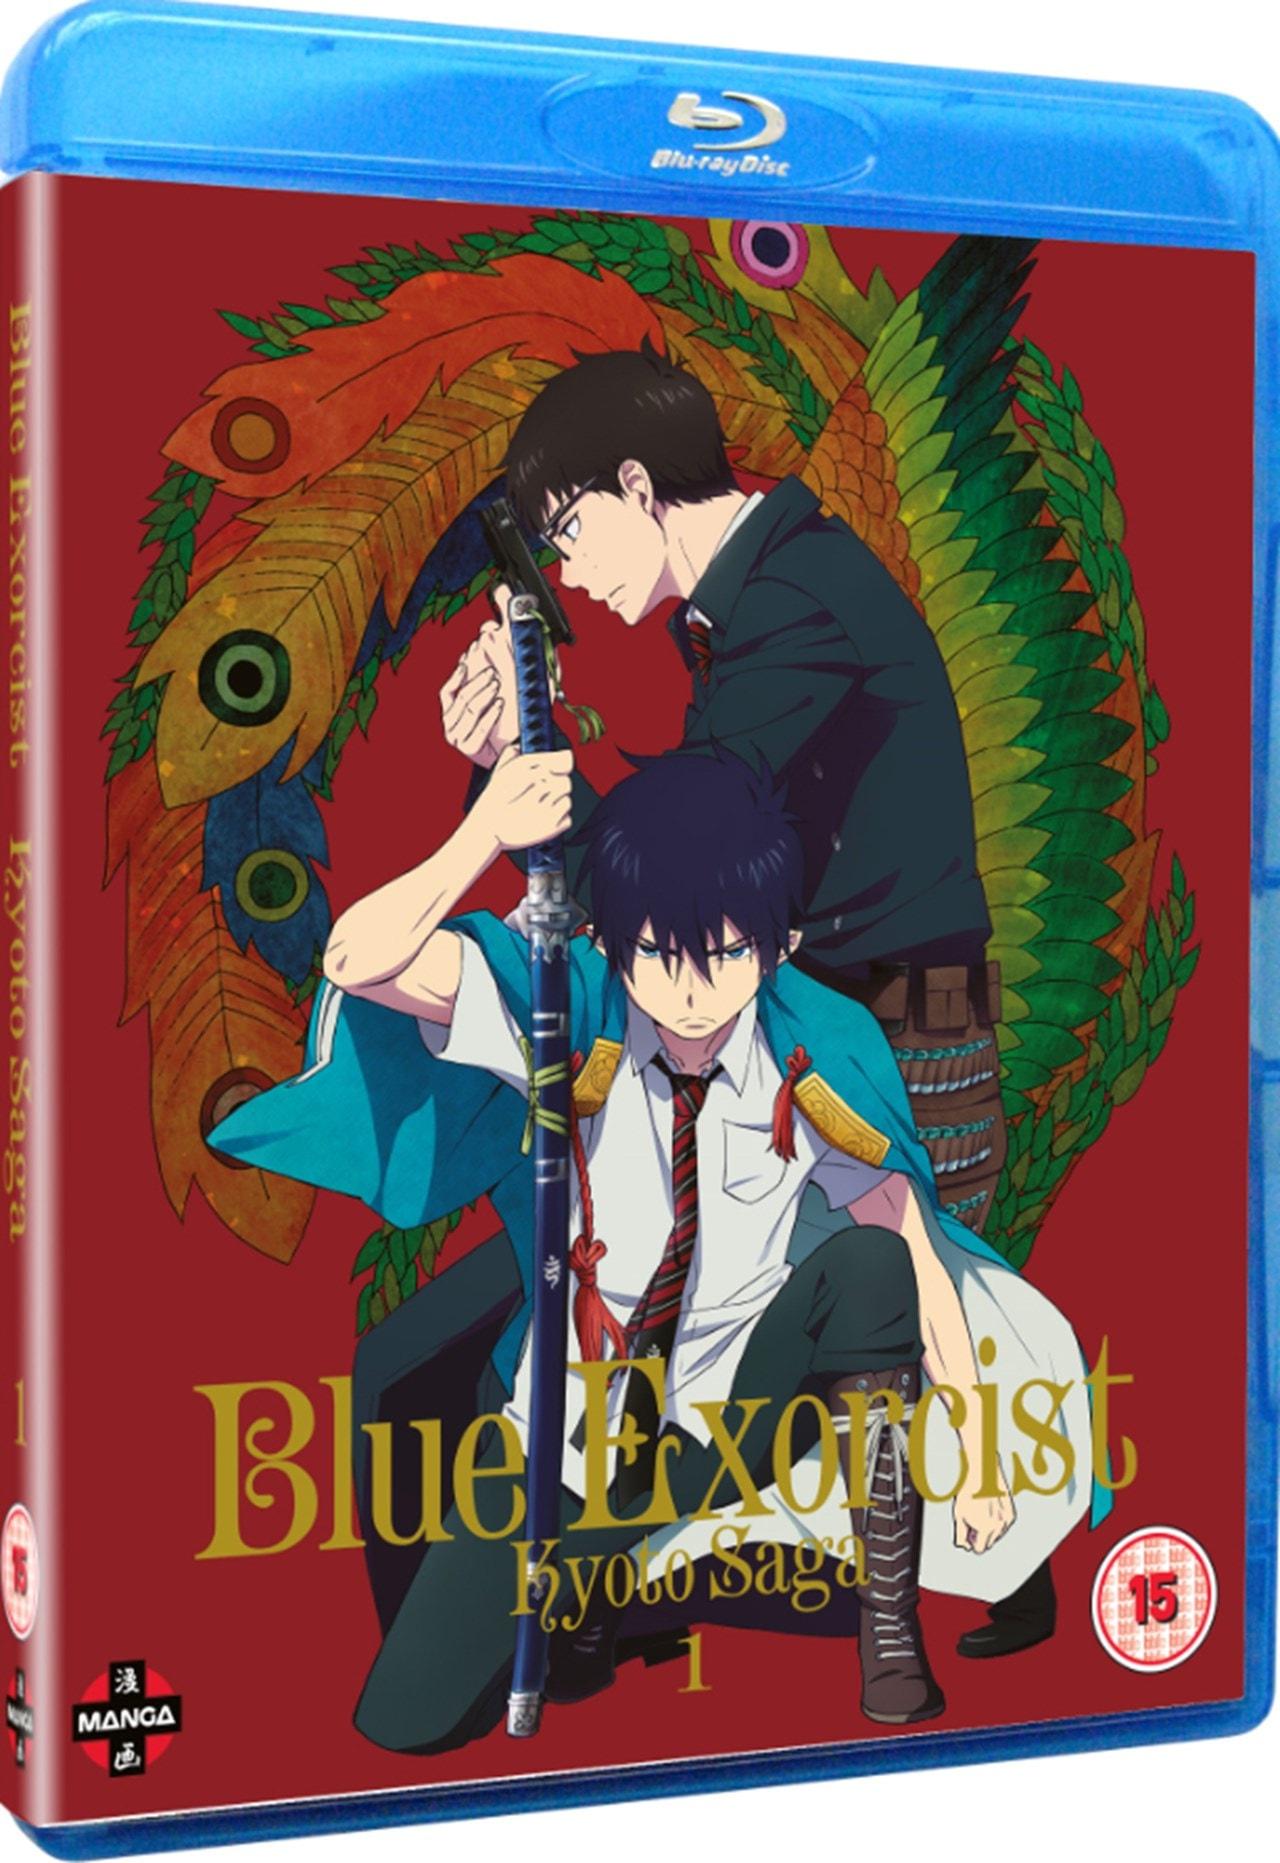 Blue Exorcist: Season 2 - Kyoto Saga Volume 1 - 1